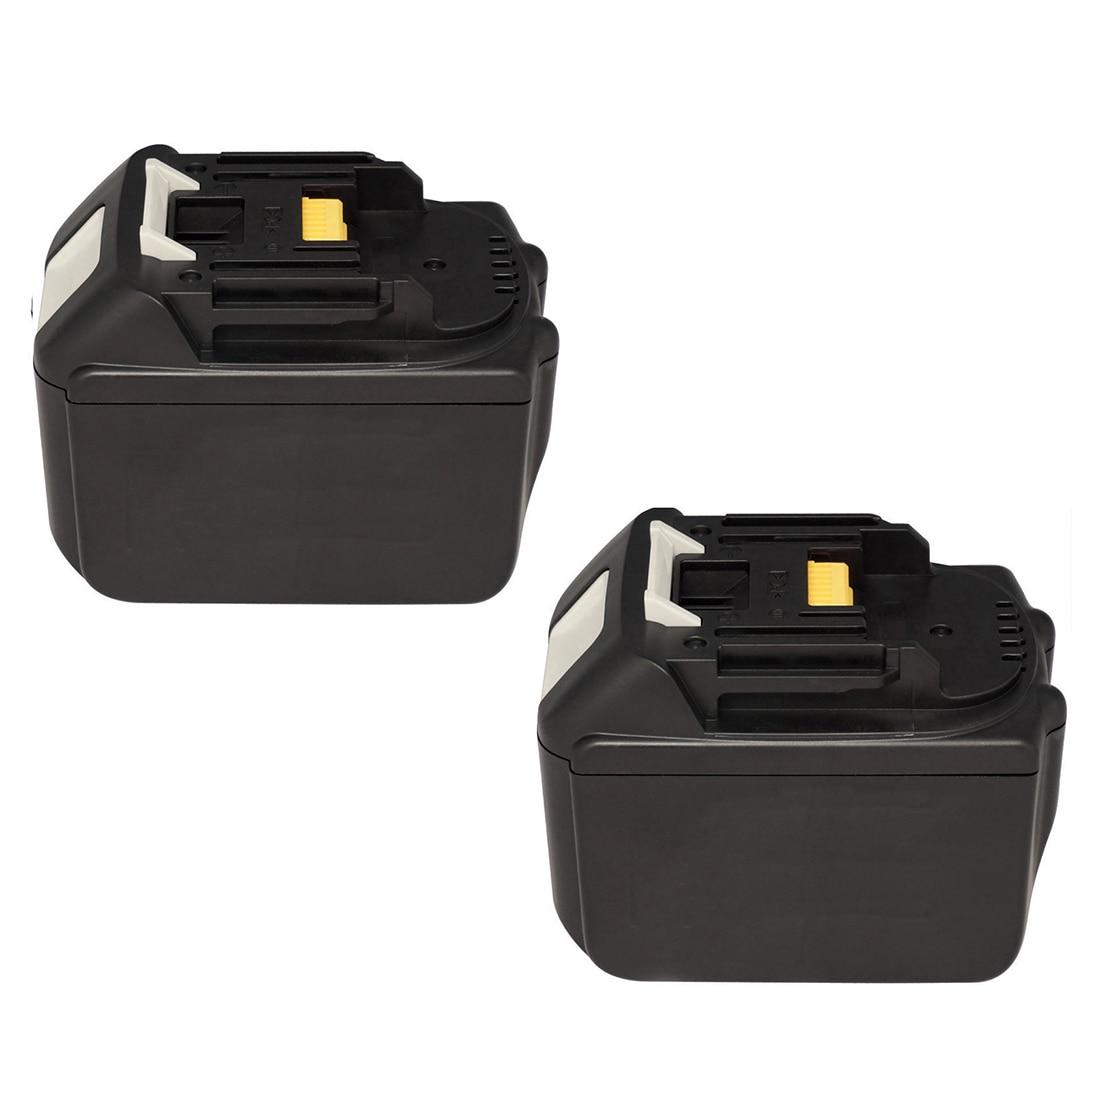 2x 4.5AH 18V Battery For Makita BL1860 BL1845 BL1840 BL1830 BL1815 Lithium Ion